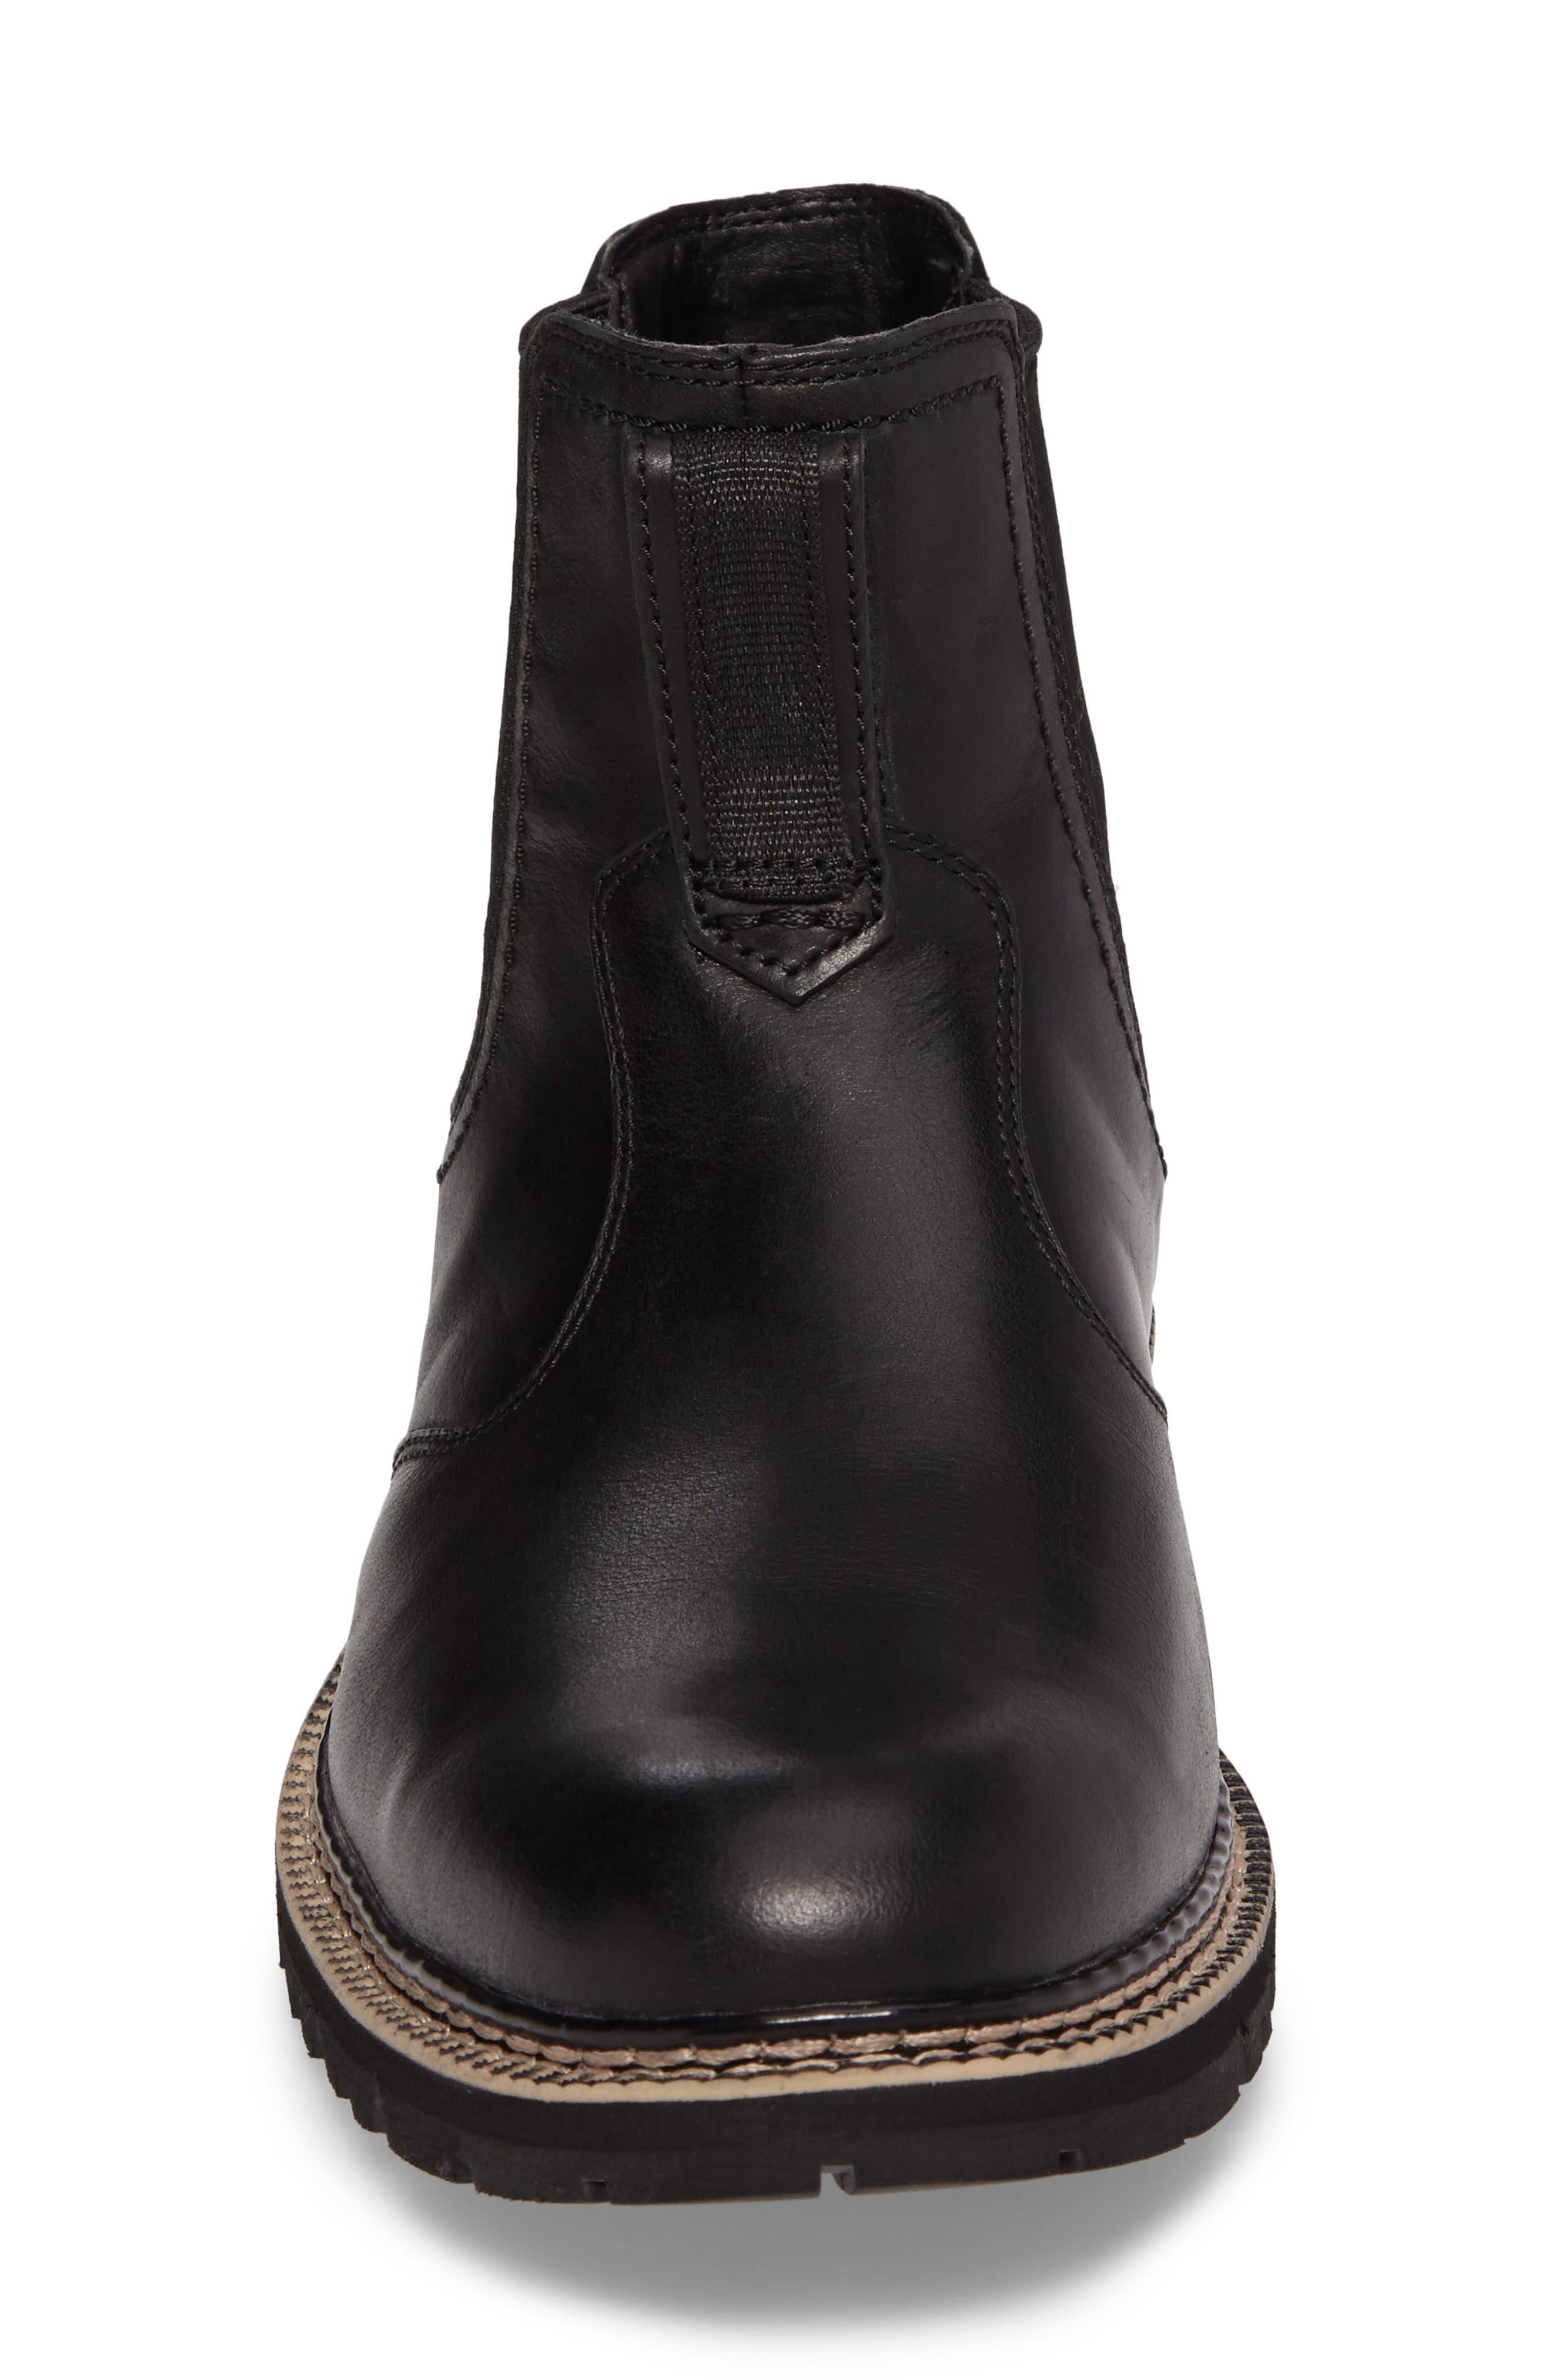 Britton Hill Chelsea Boot,                             Alternate thumbnail 4, color,                             001